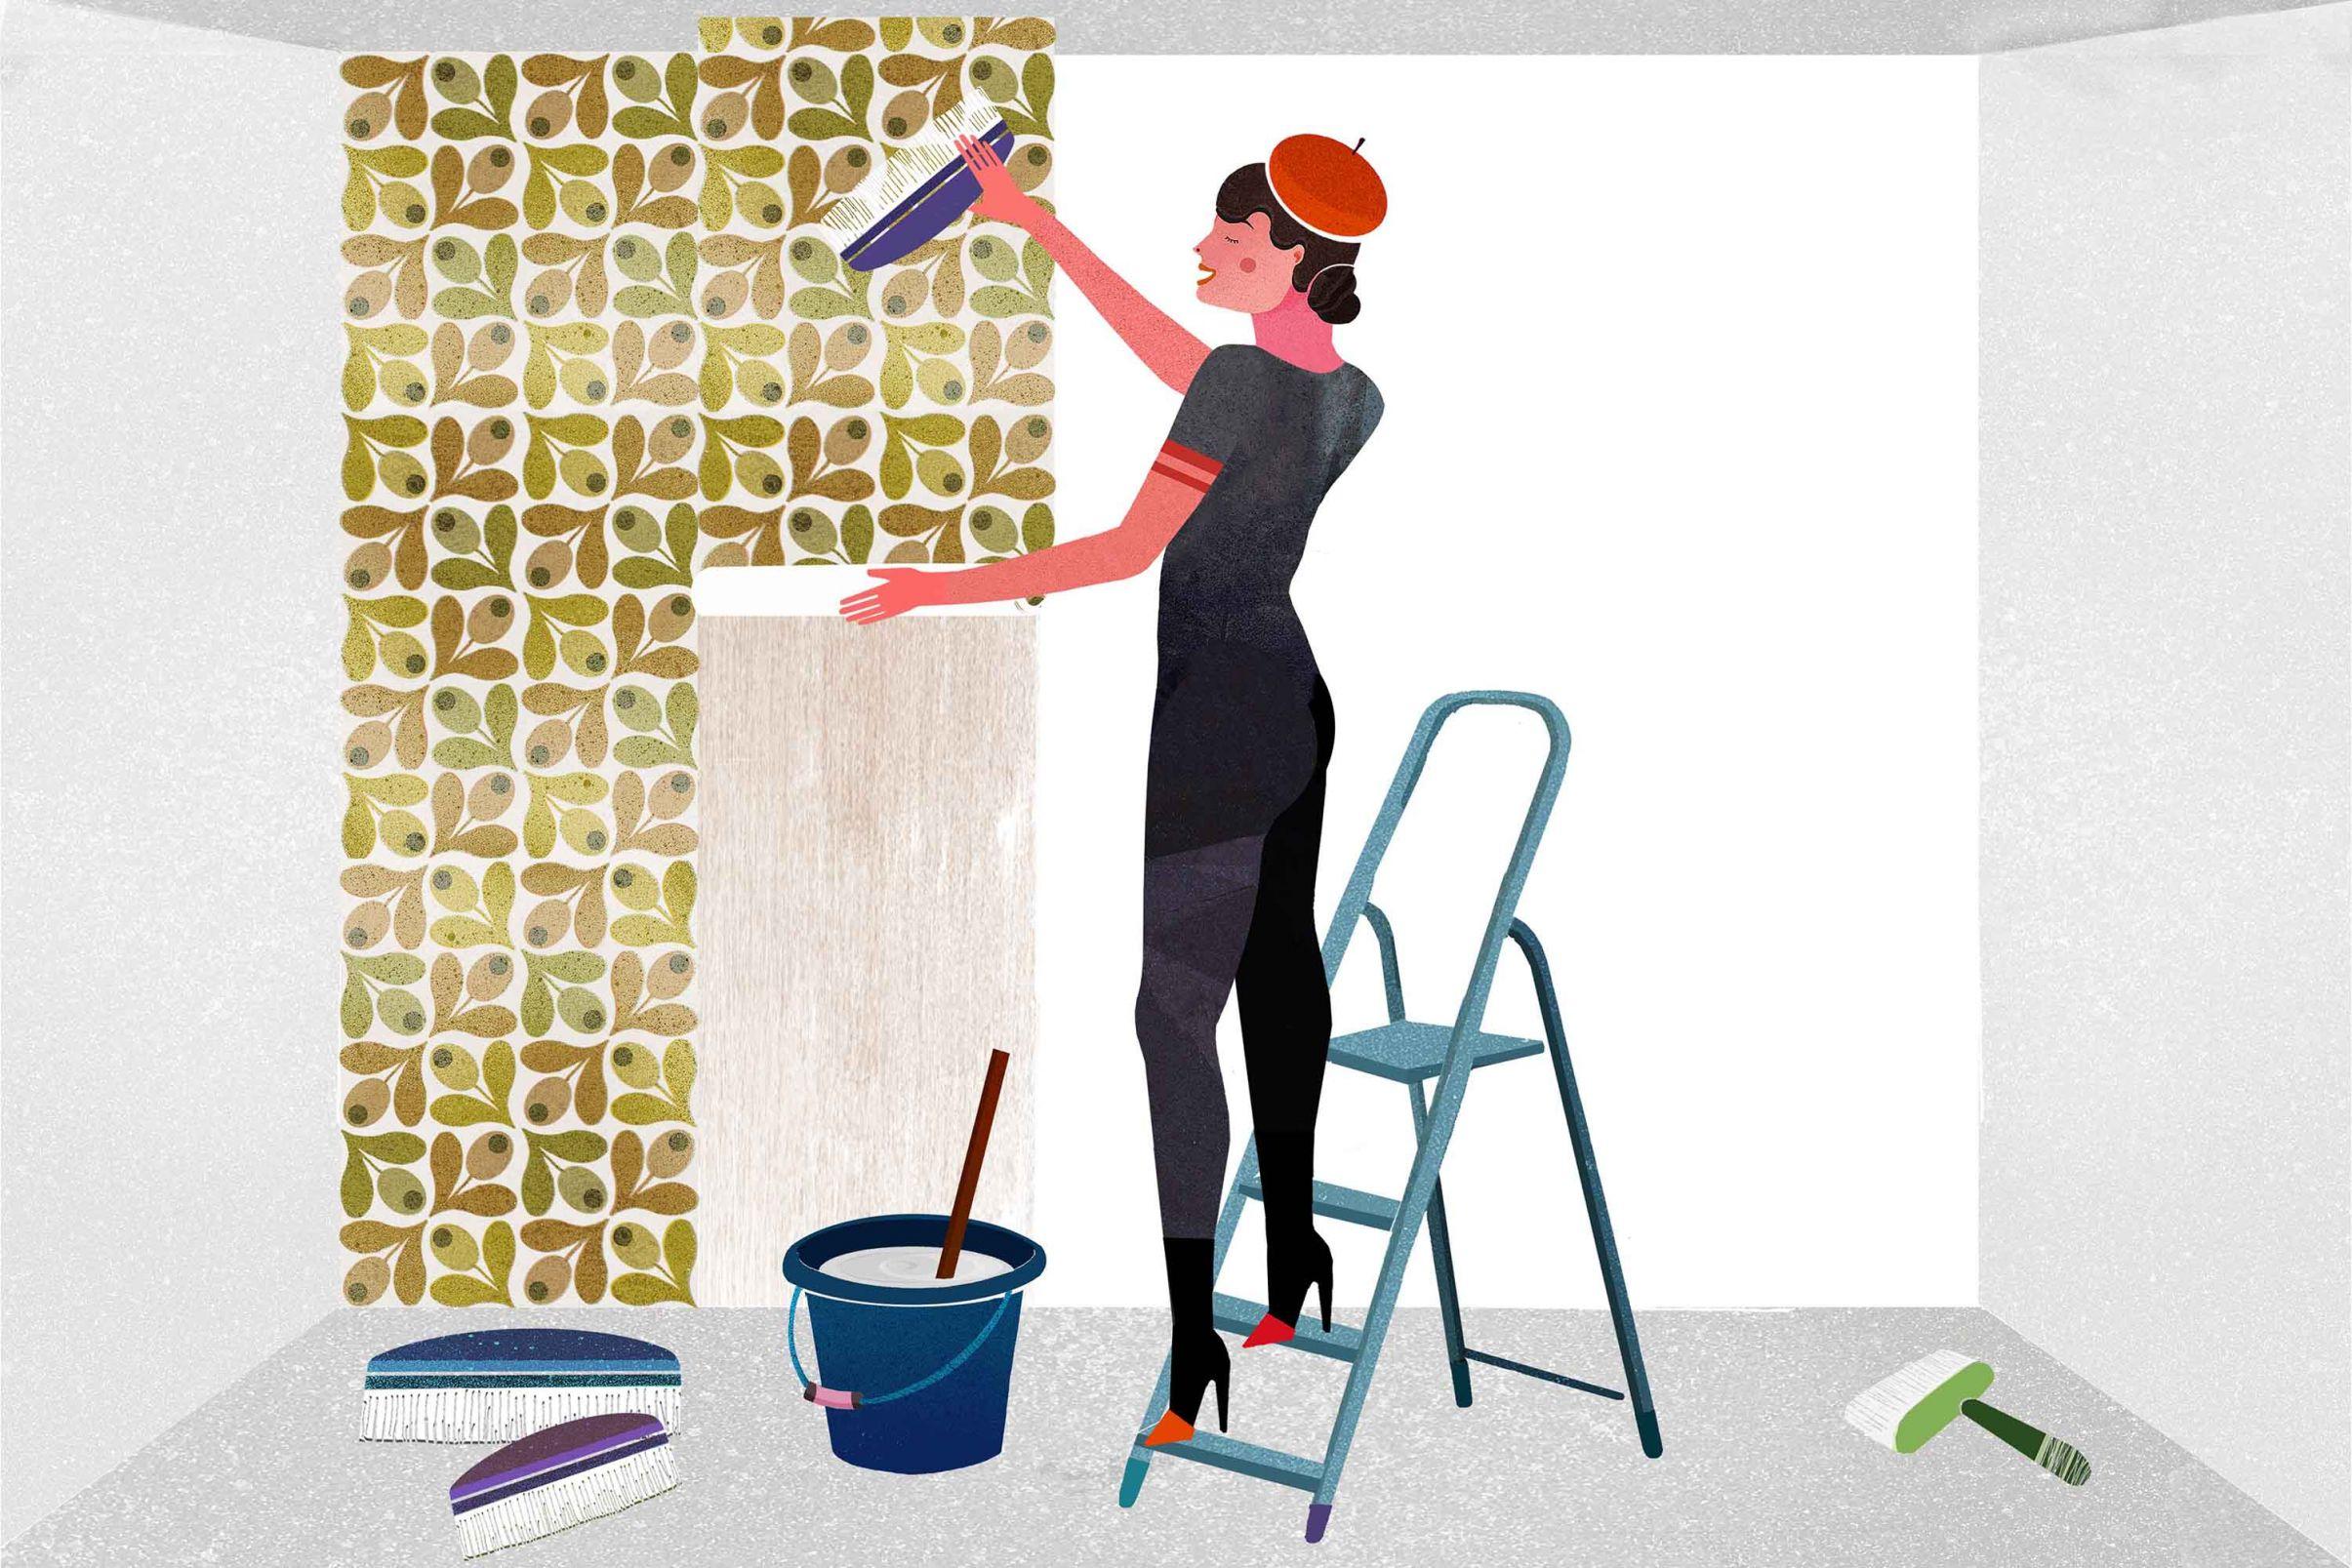 Como-pendurar-papel-de-parede-TNT-Colocar-as-tiras-de-papel-de-parede-na-parede